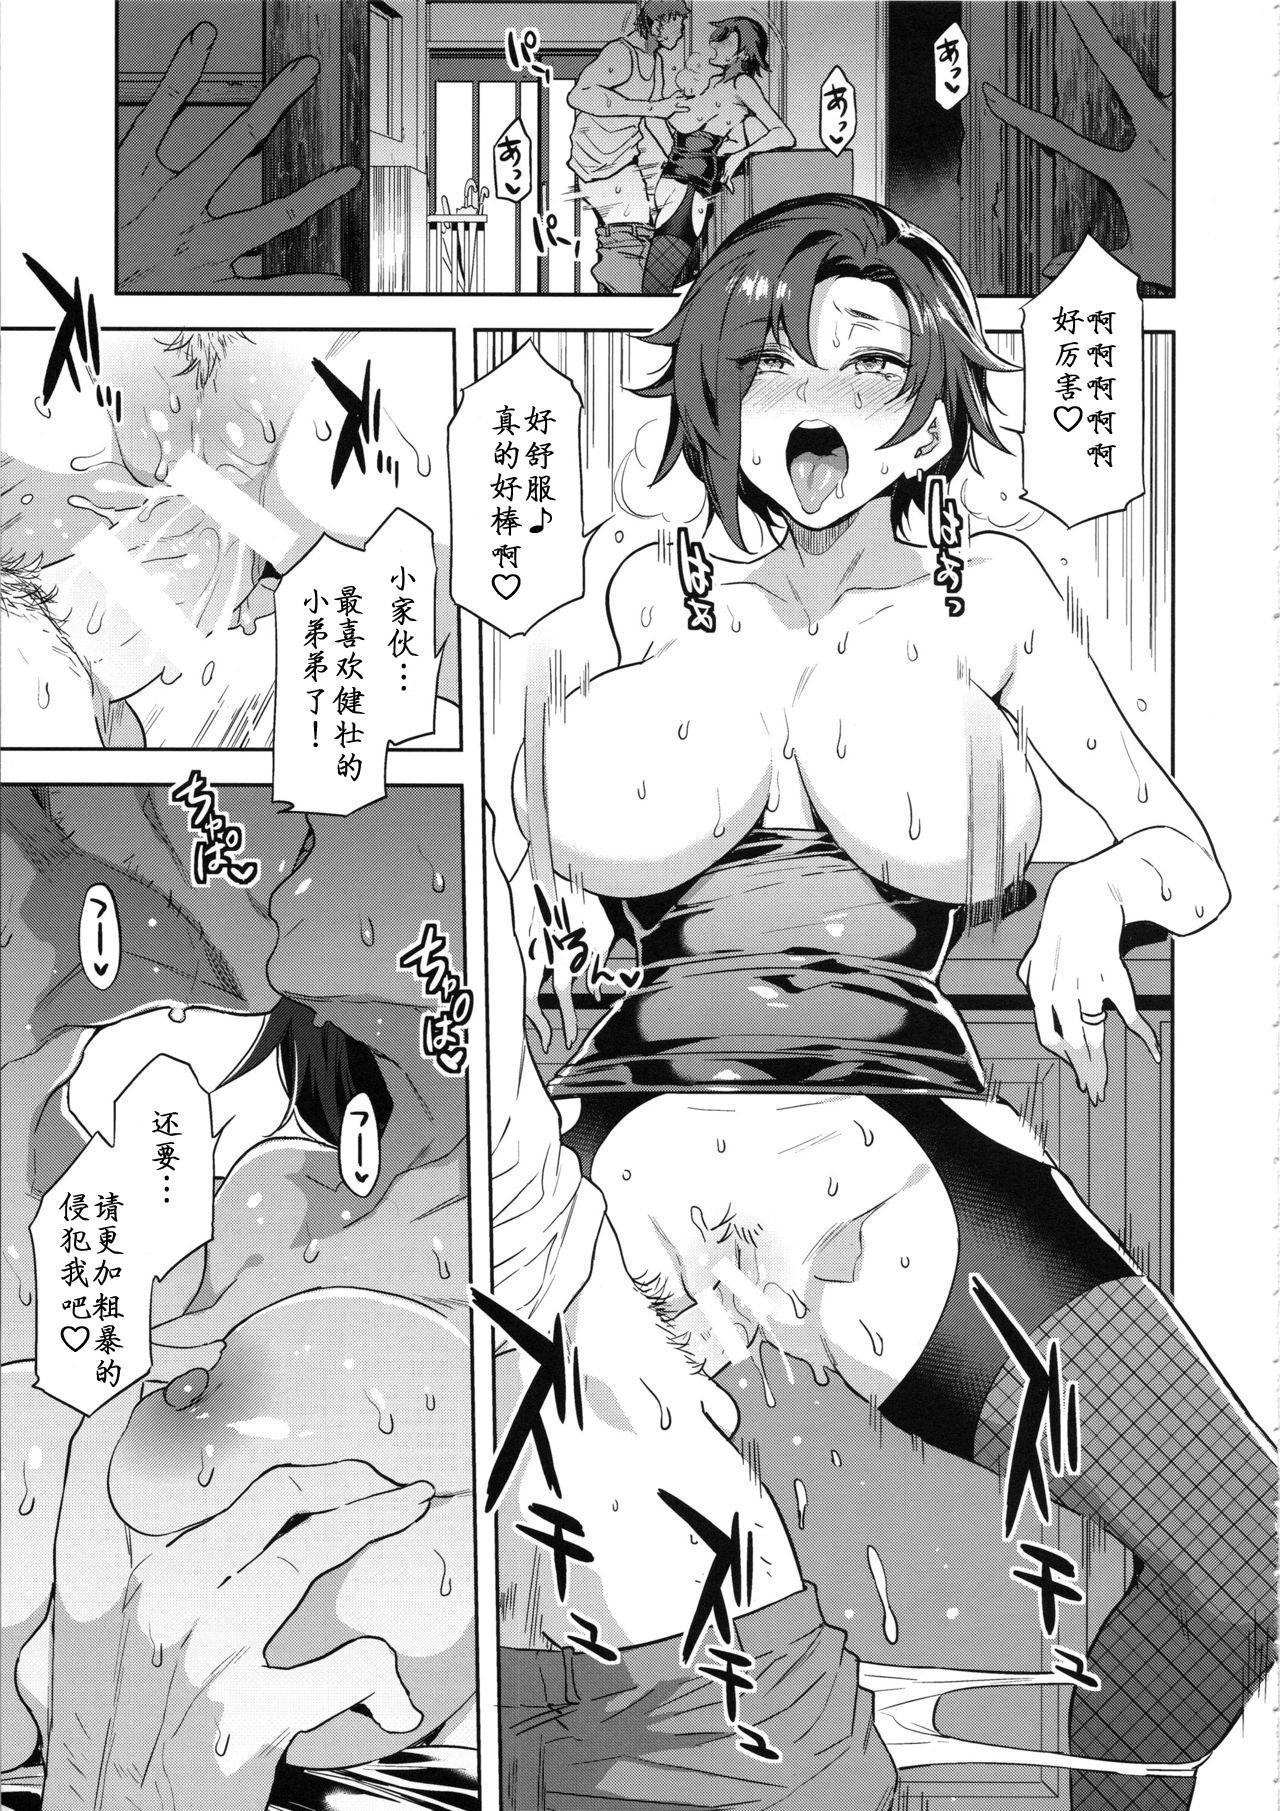 Teisou Kannen Zero no Onna Tomodachi no Haha 13